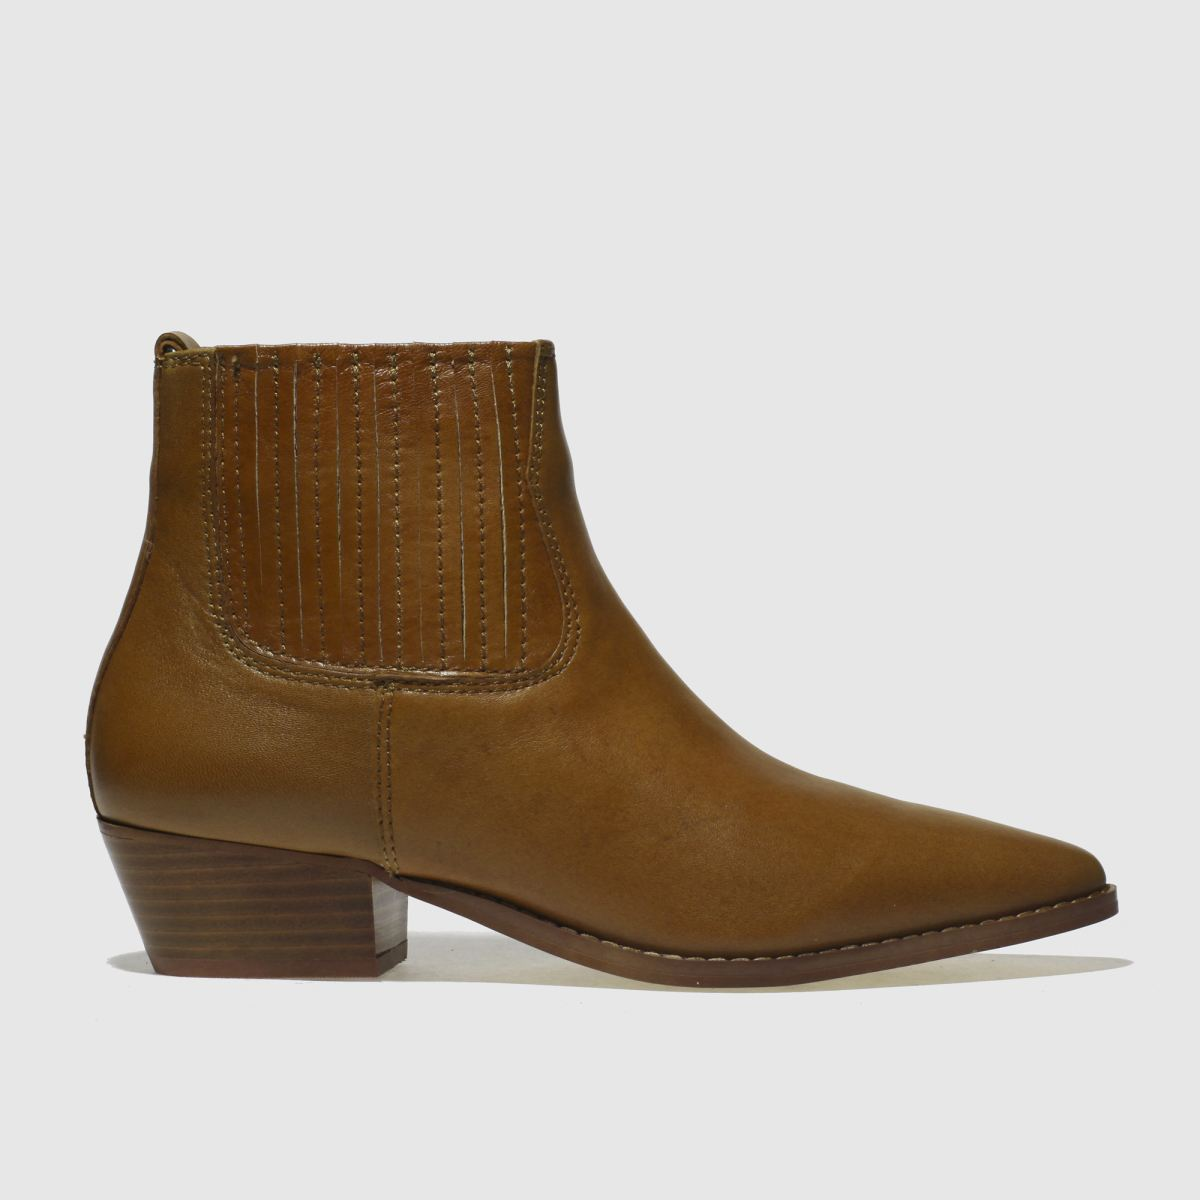 Schuh Tan Nashville Boots